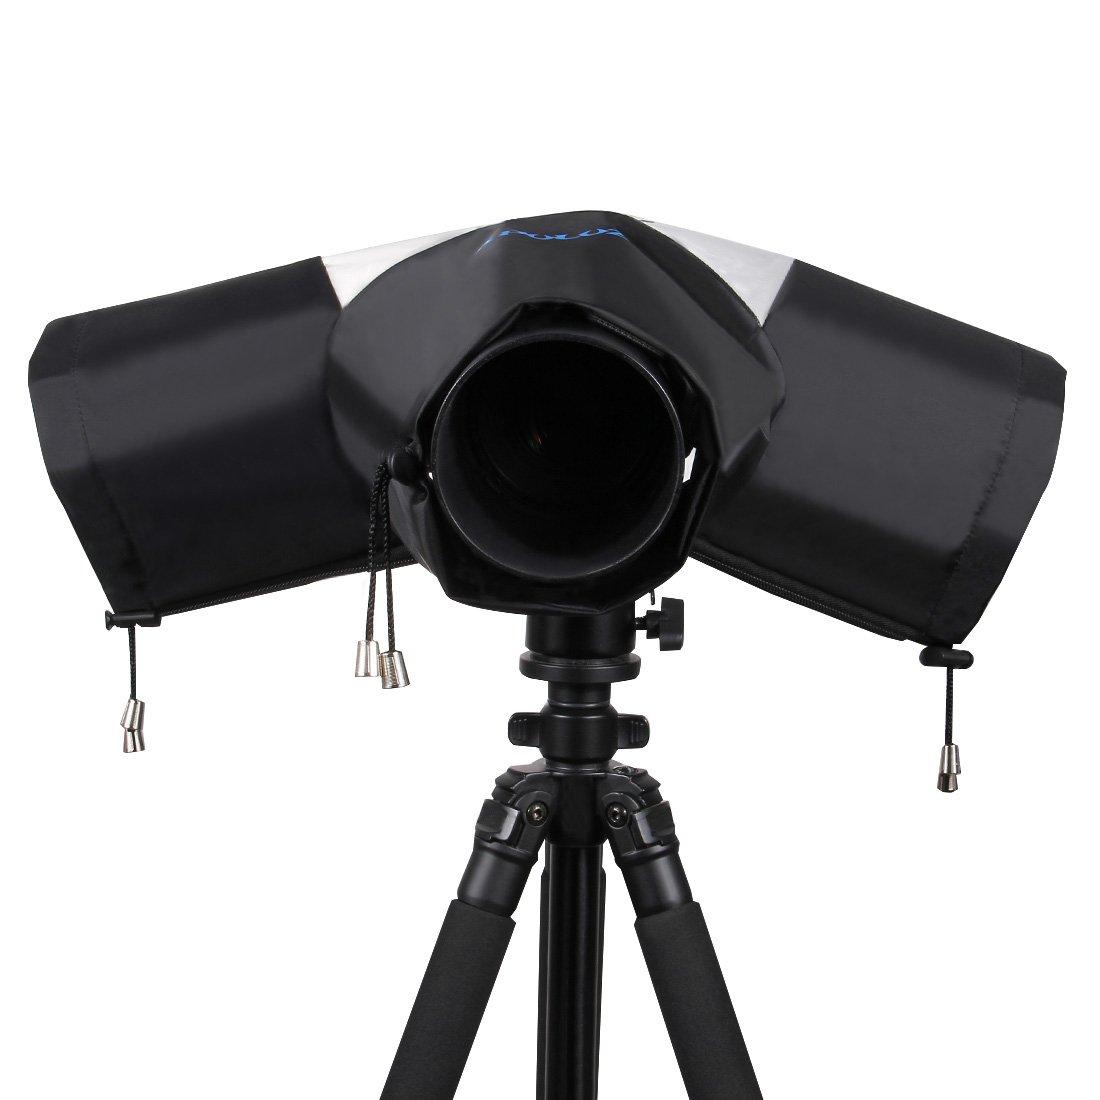 Cimostar Rainproof Camera Protector, Rain Cover for Canon Nikon and All DSLR Camera